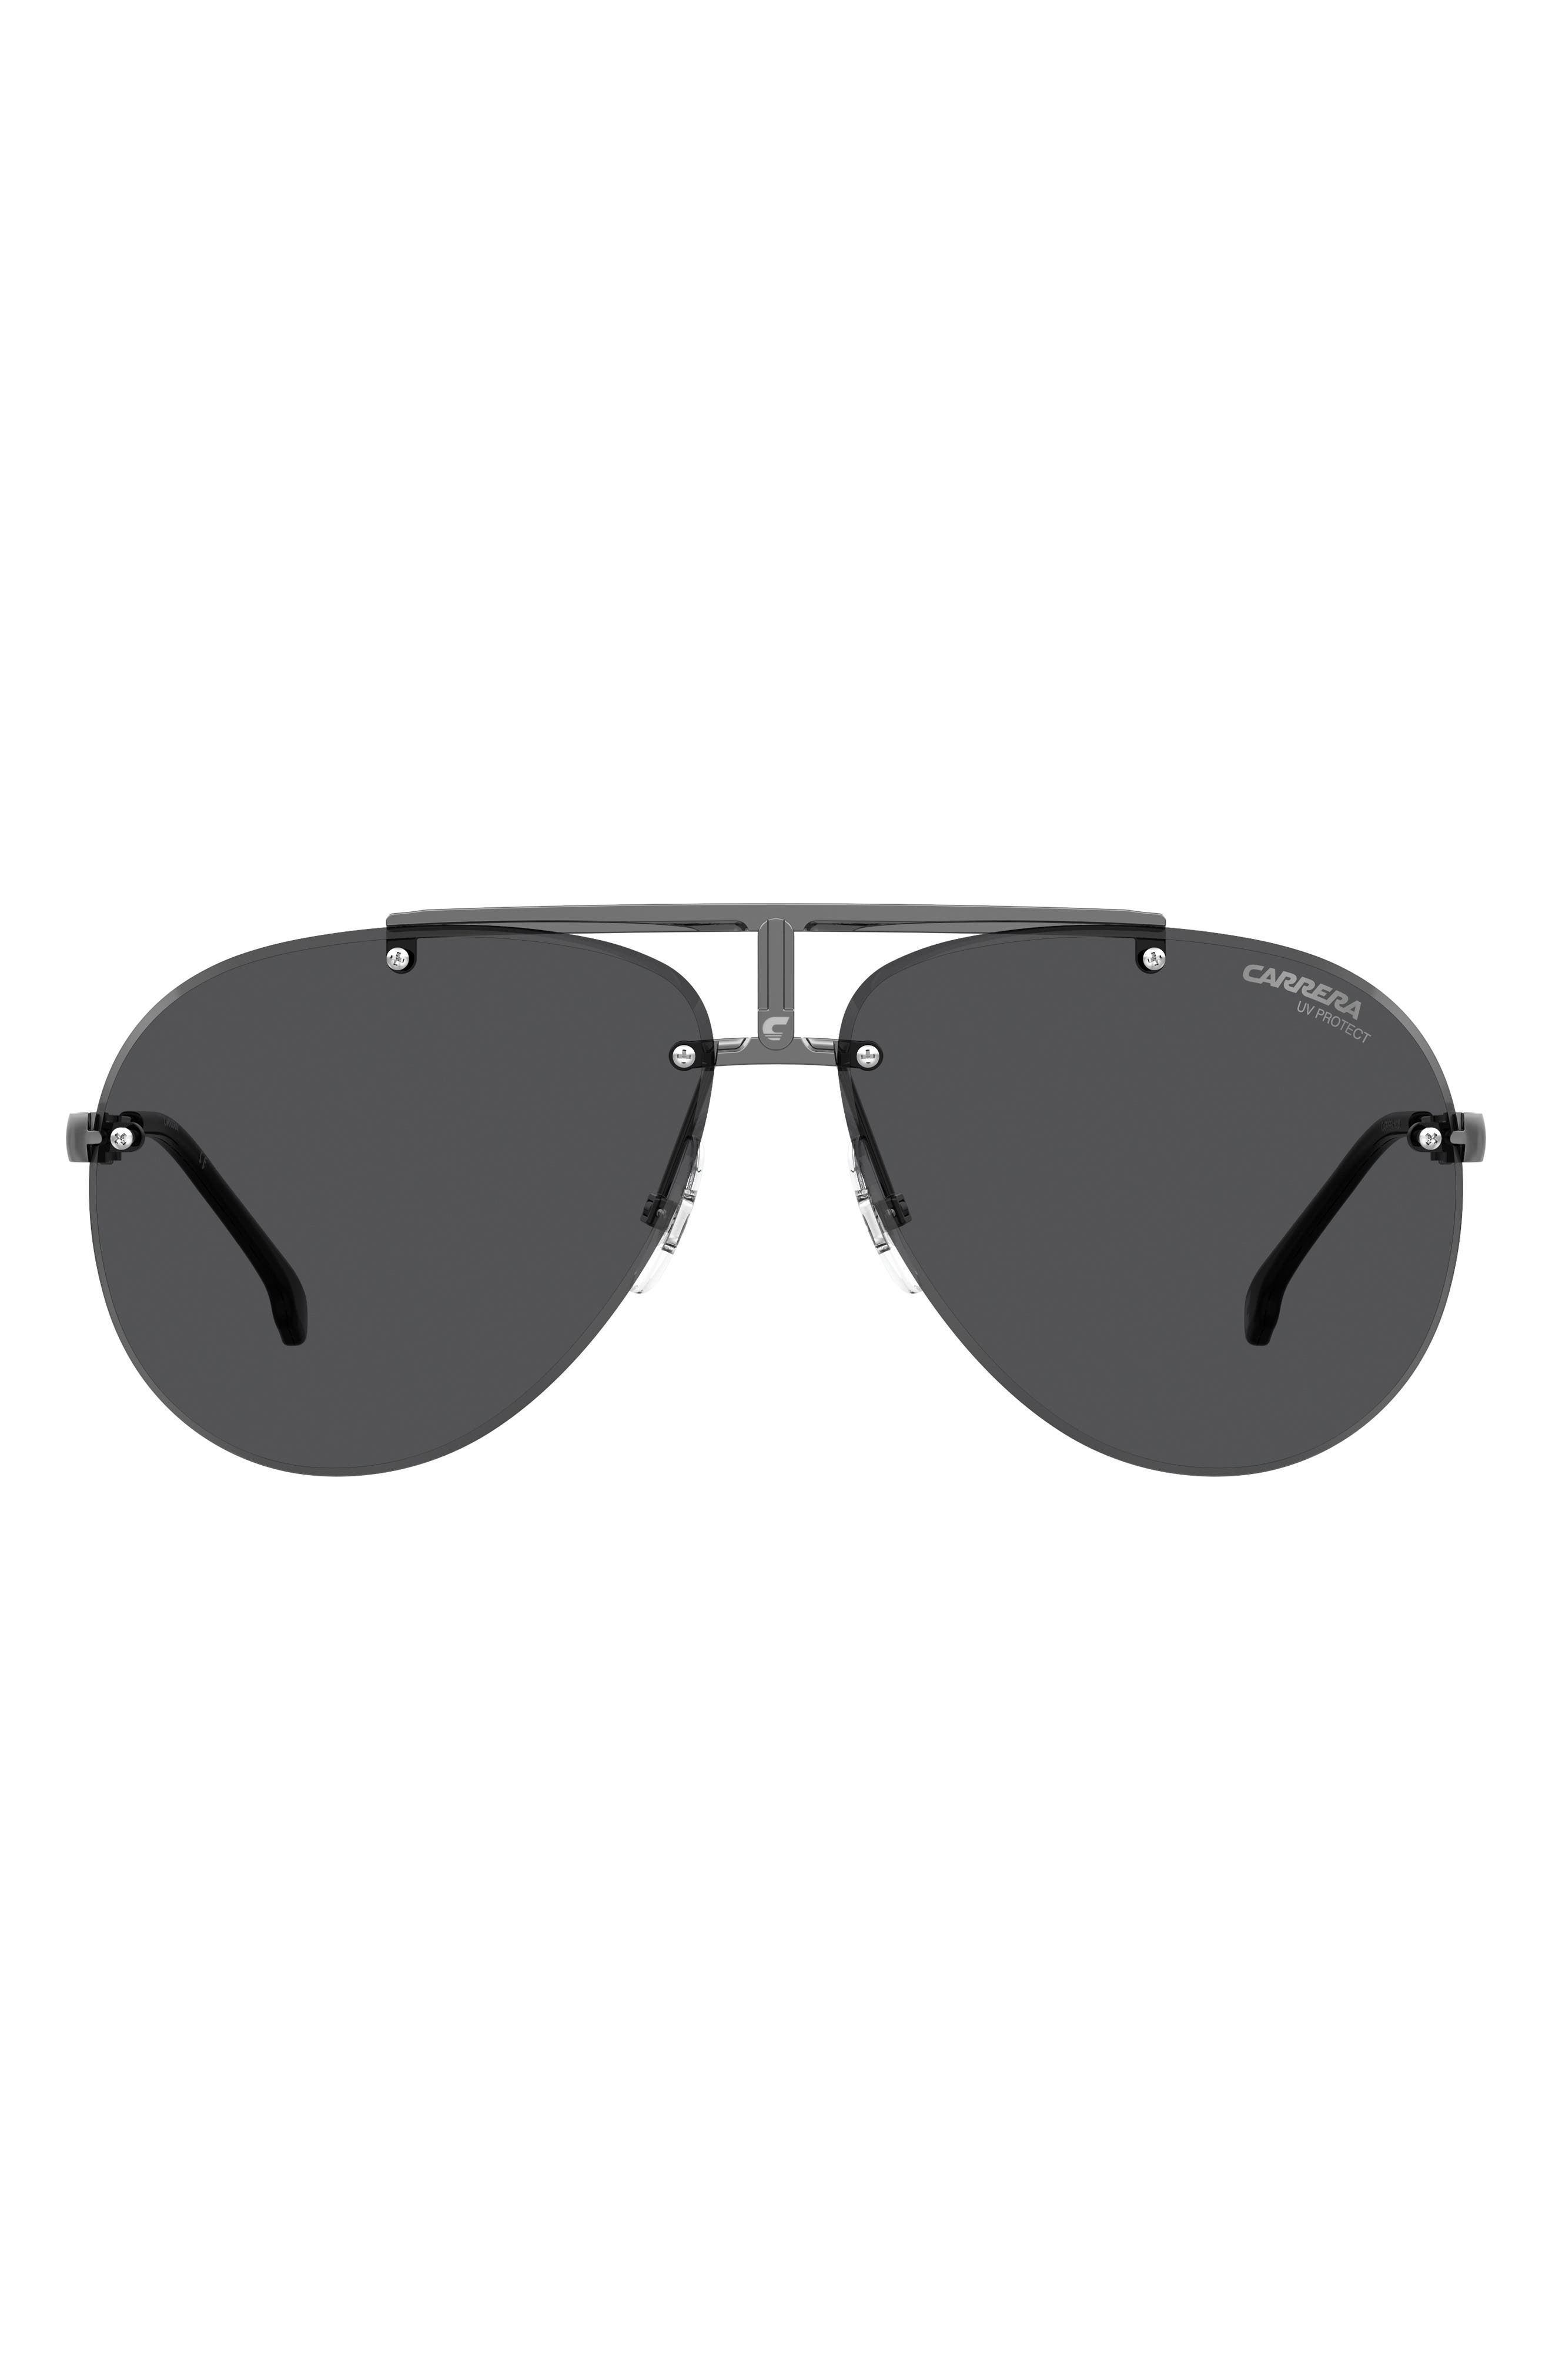 62mm Rimless Aviator Sunglasses